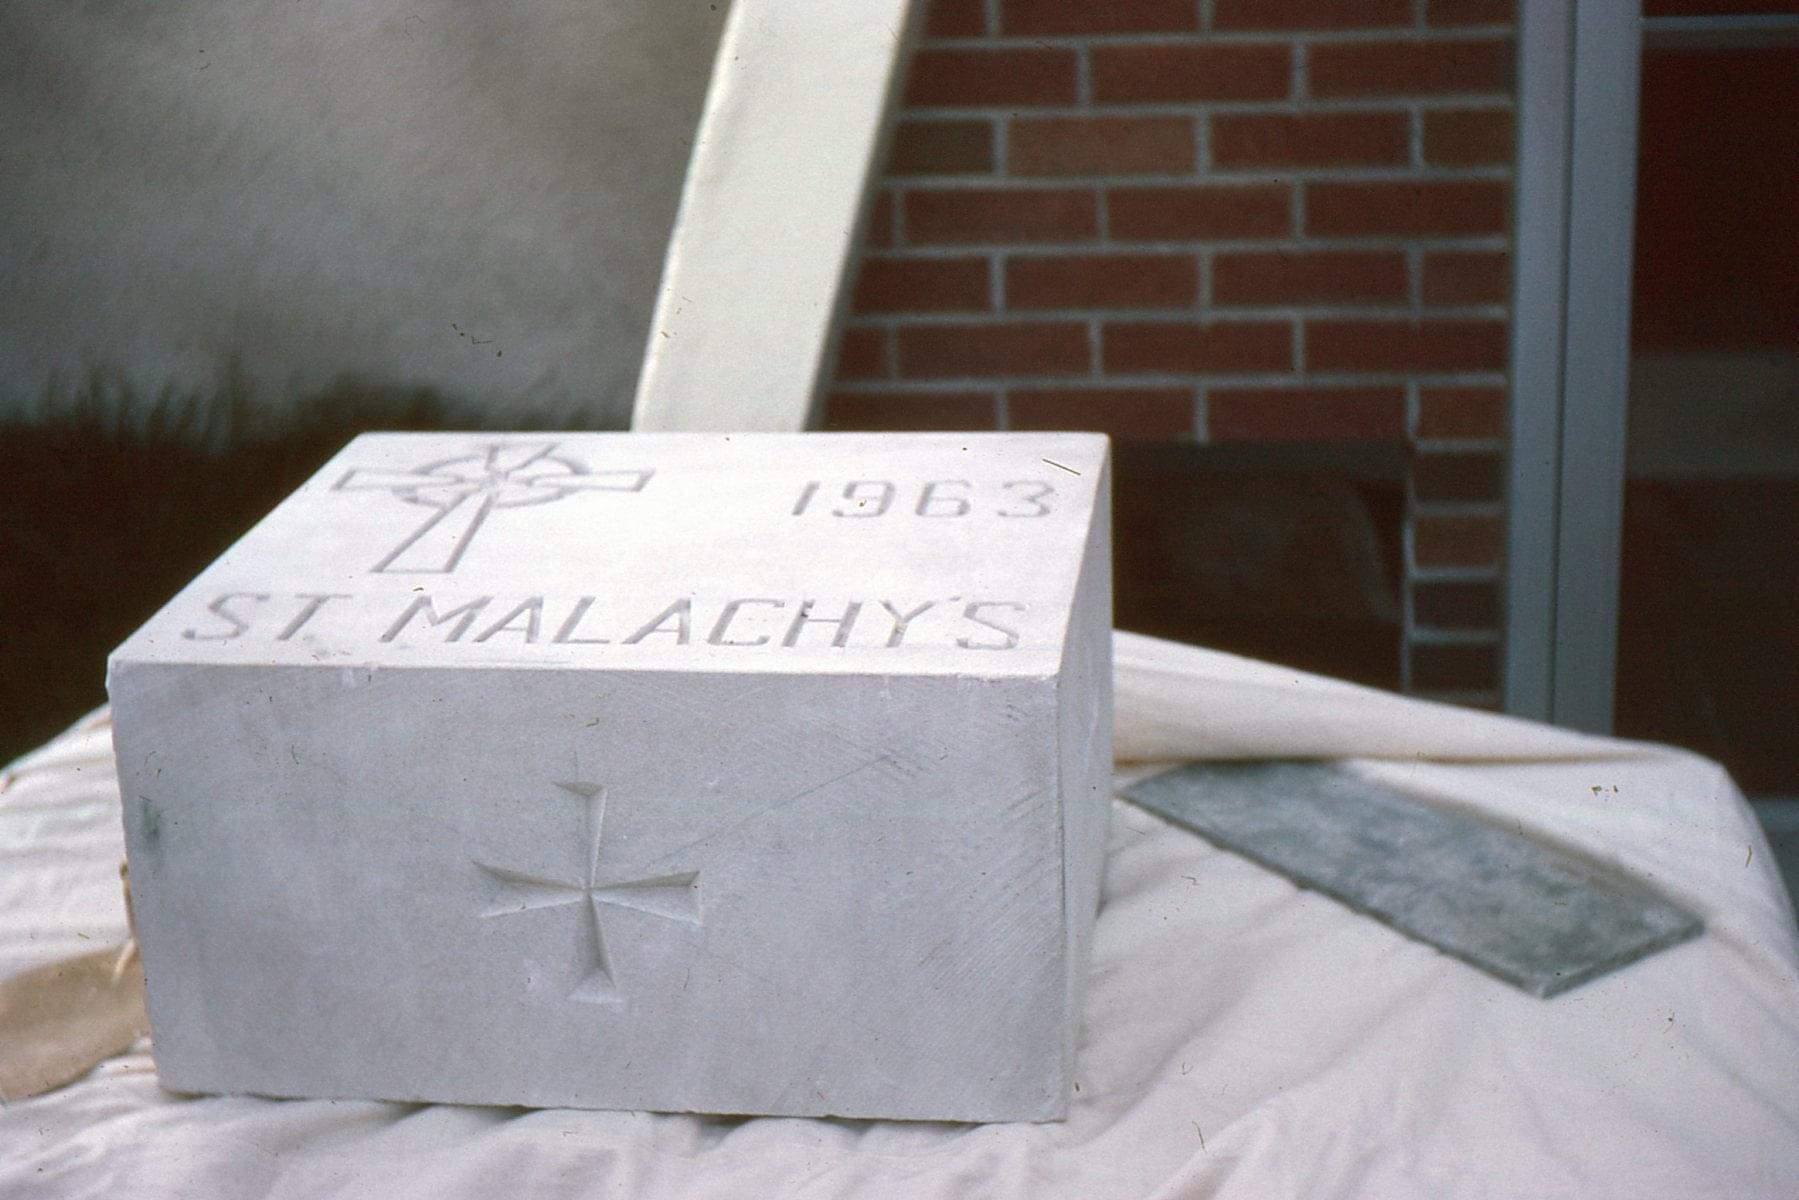 St. Malachy's cornerstone